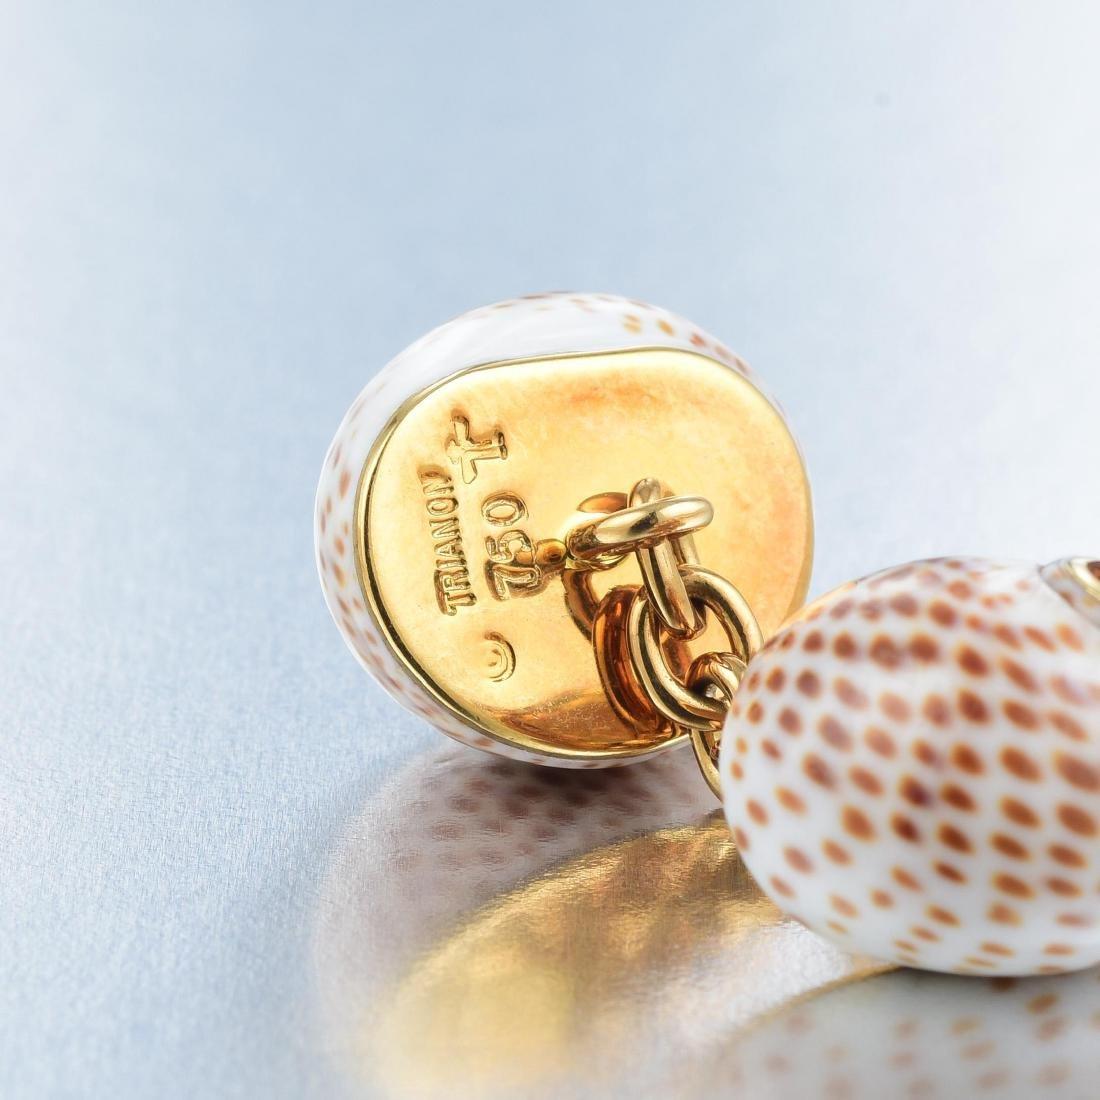 Trianon Seashell and Citrine Cufflinks - 2